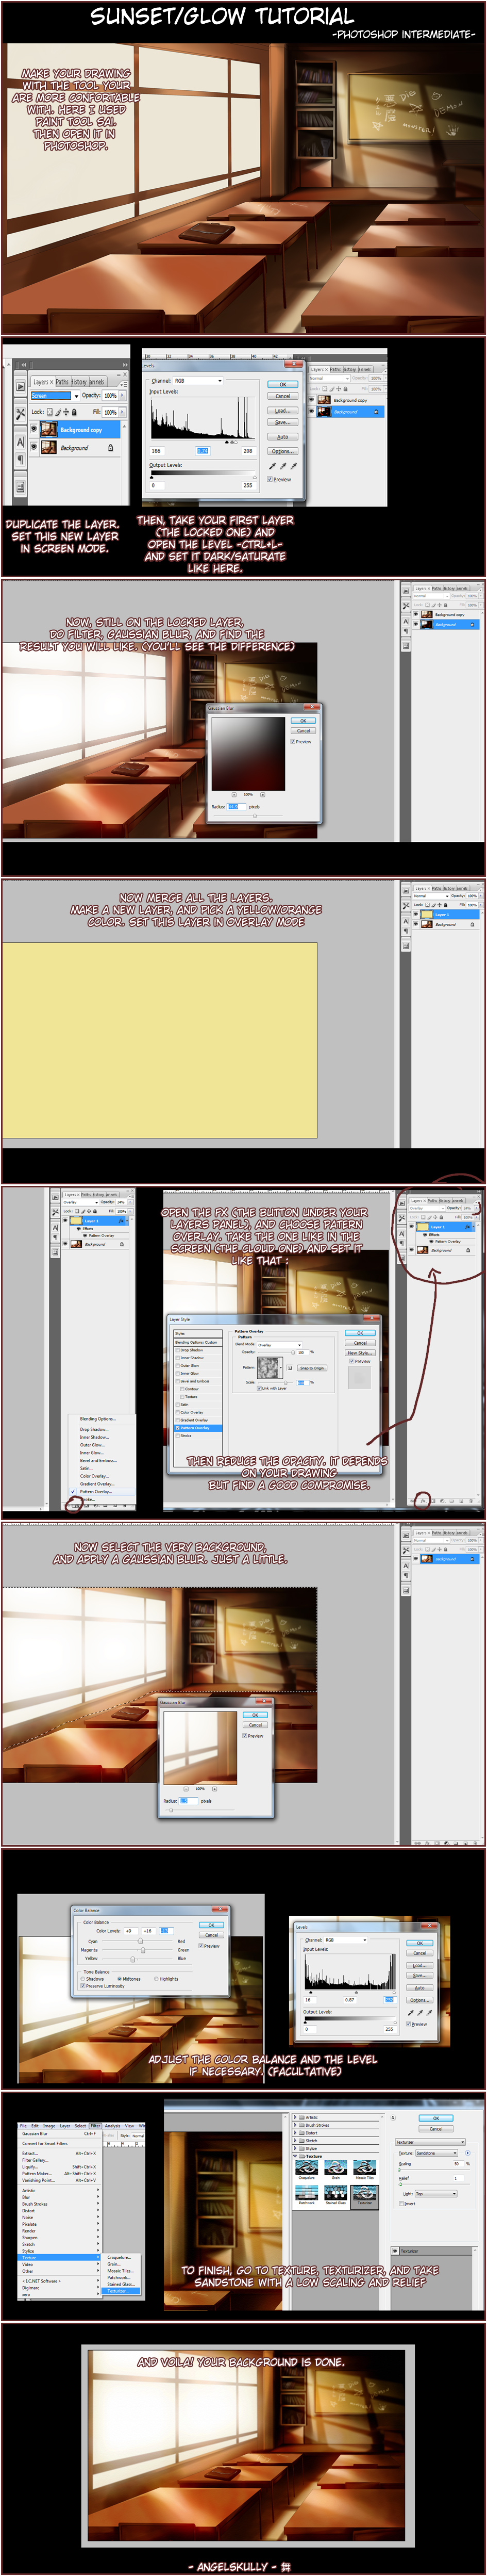 Glow tutorial photoshop by kuro mai on deviantart photoshop computer art glow tutorial photoshop by kuro mai on deviantart baditri Image collections